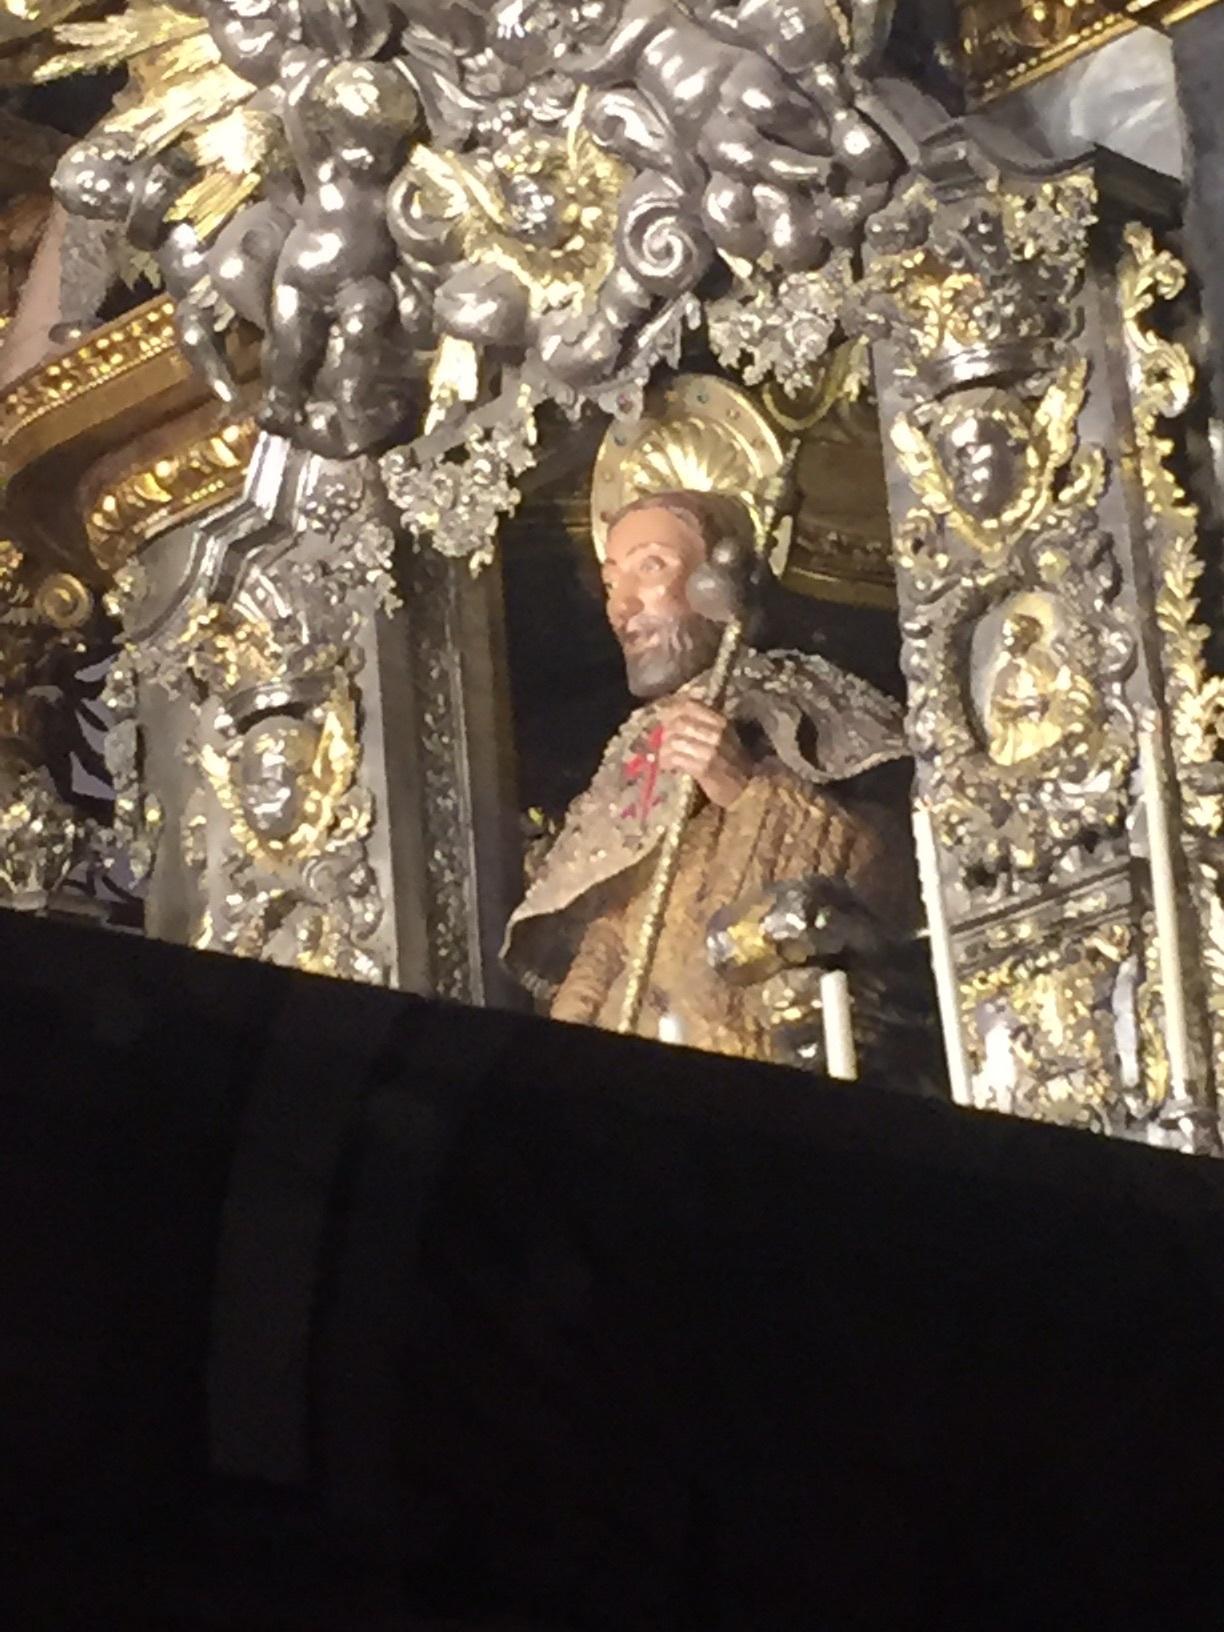 St James as centerpiece of altar